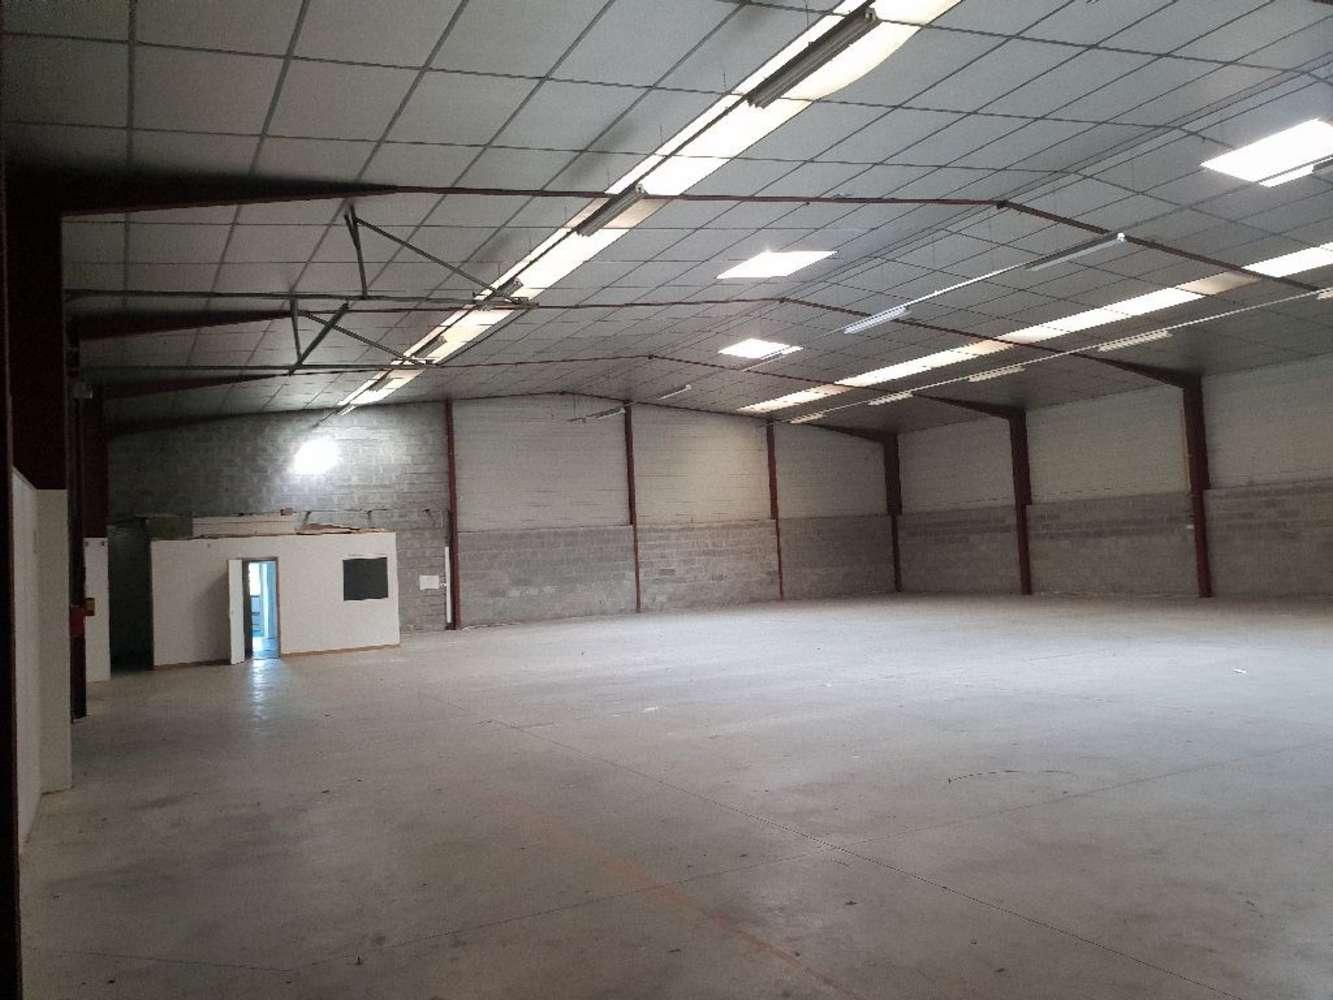 Activités/entrepôt Chassieu, 69680 - Chassieu Park - Location entrepot Lyon - 10261834